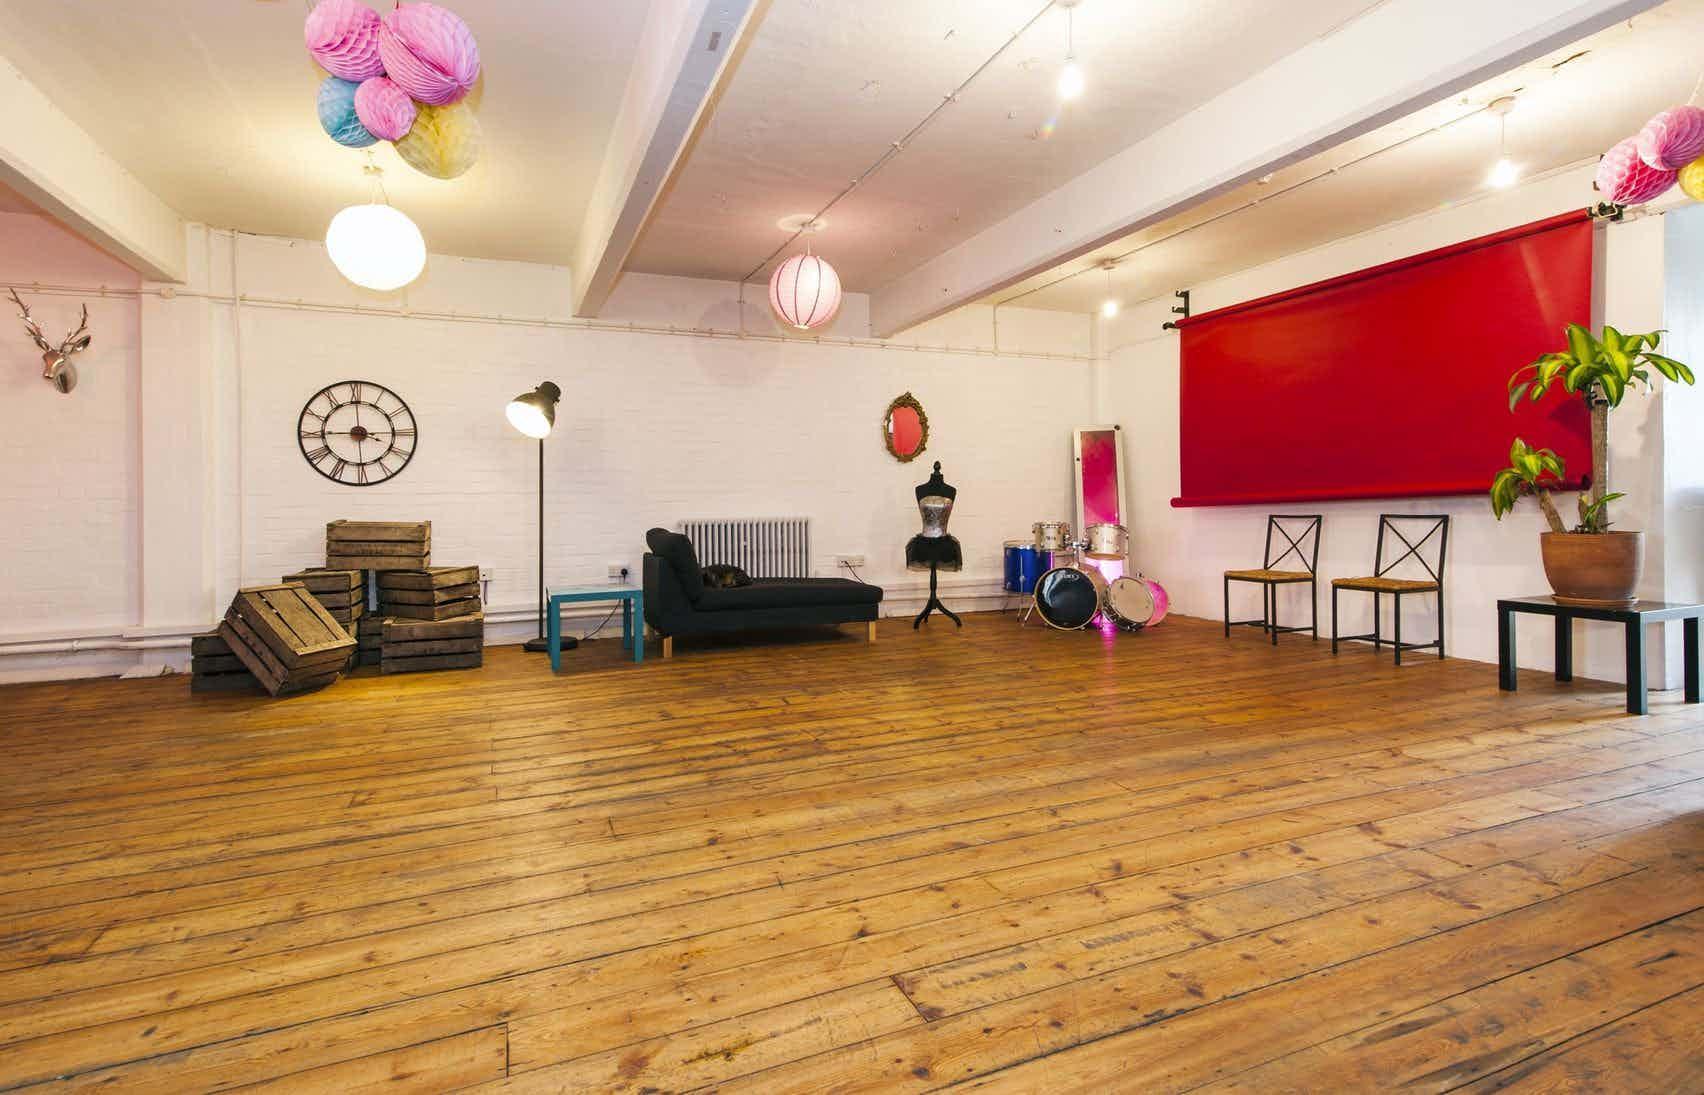 Whole Studio, 4th Floor Studios